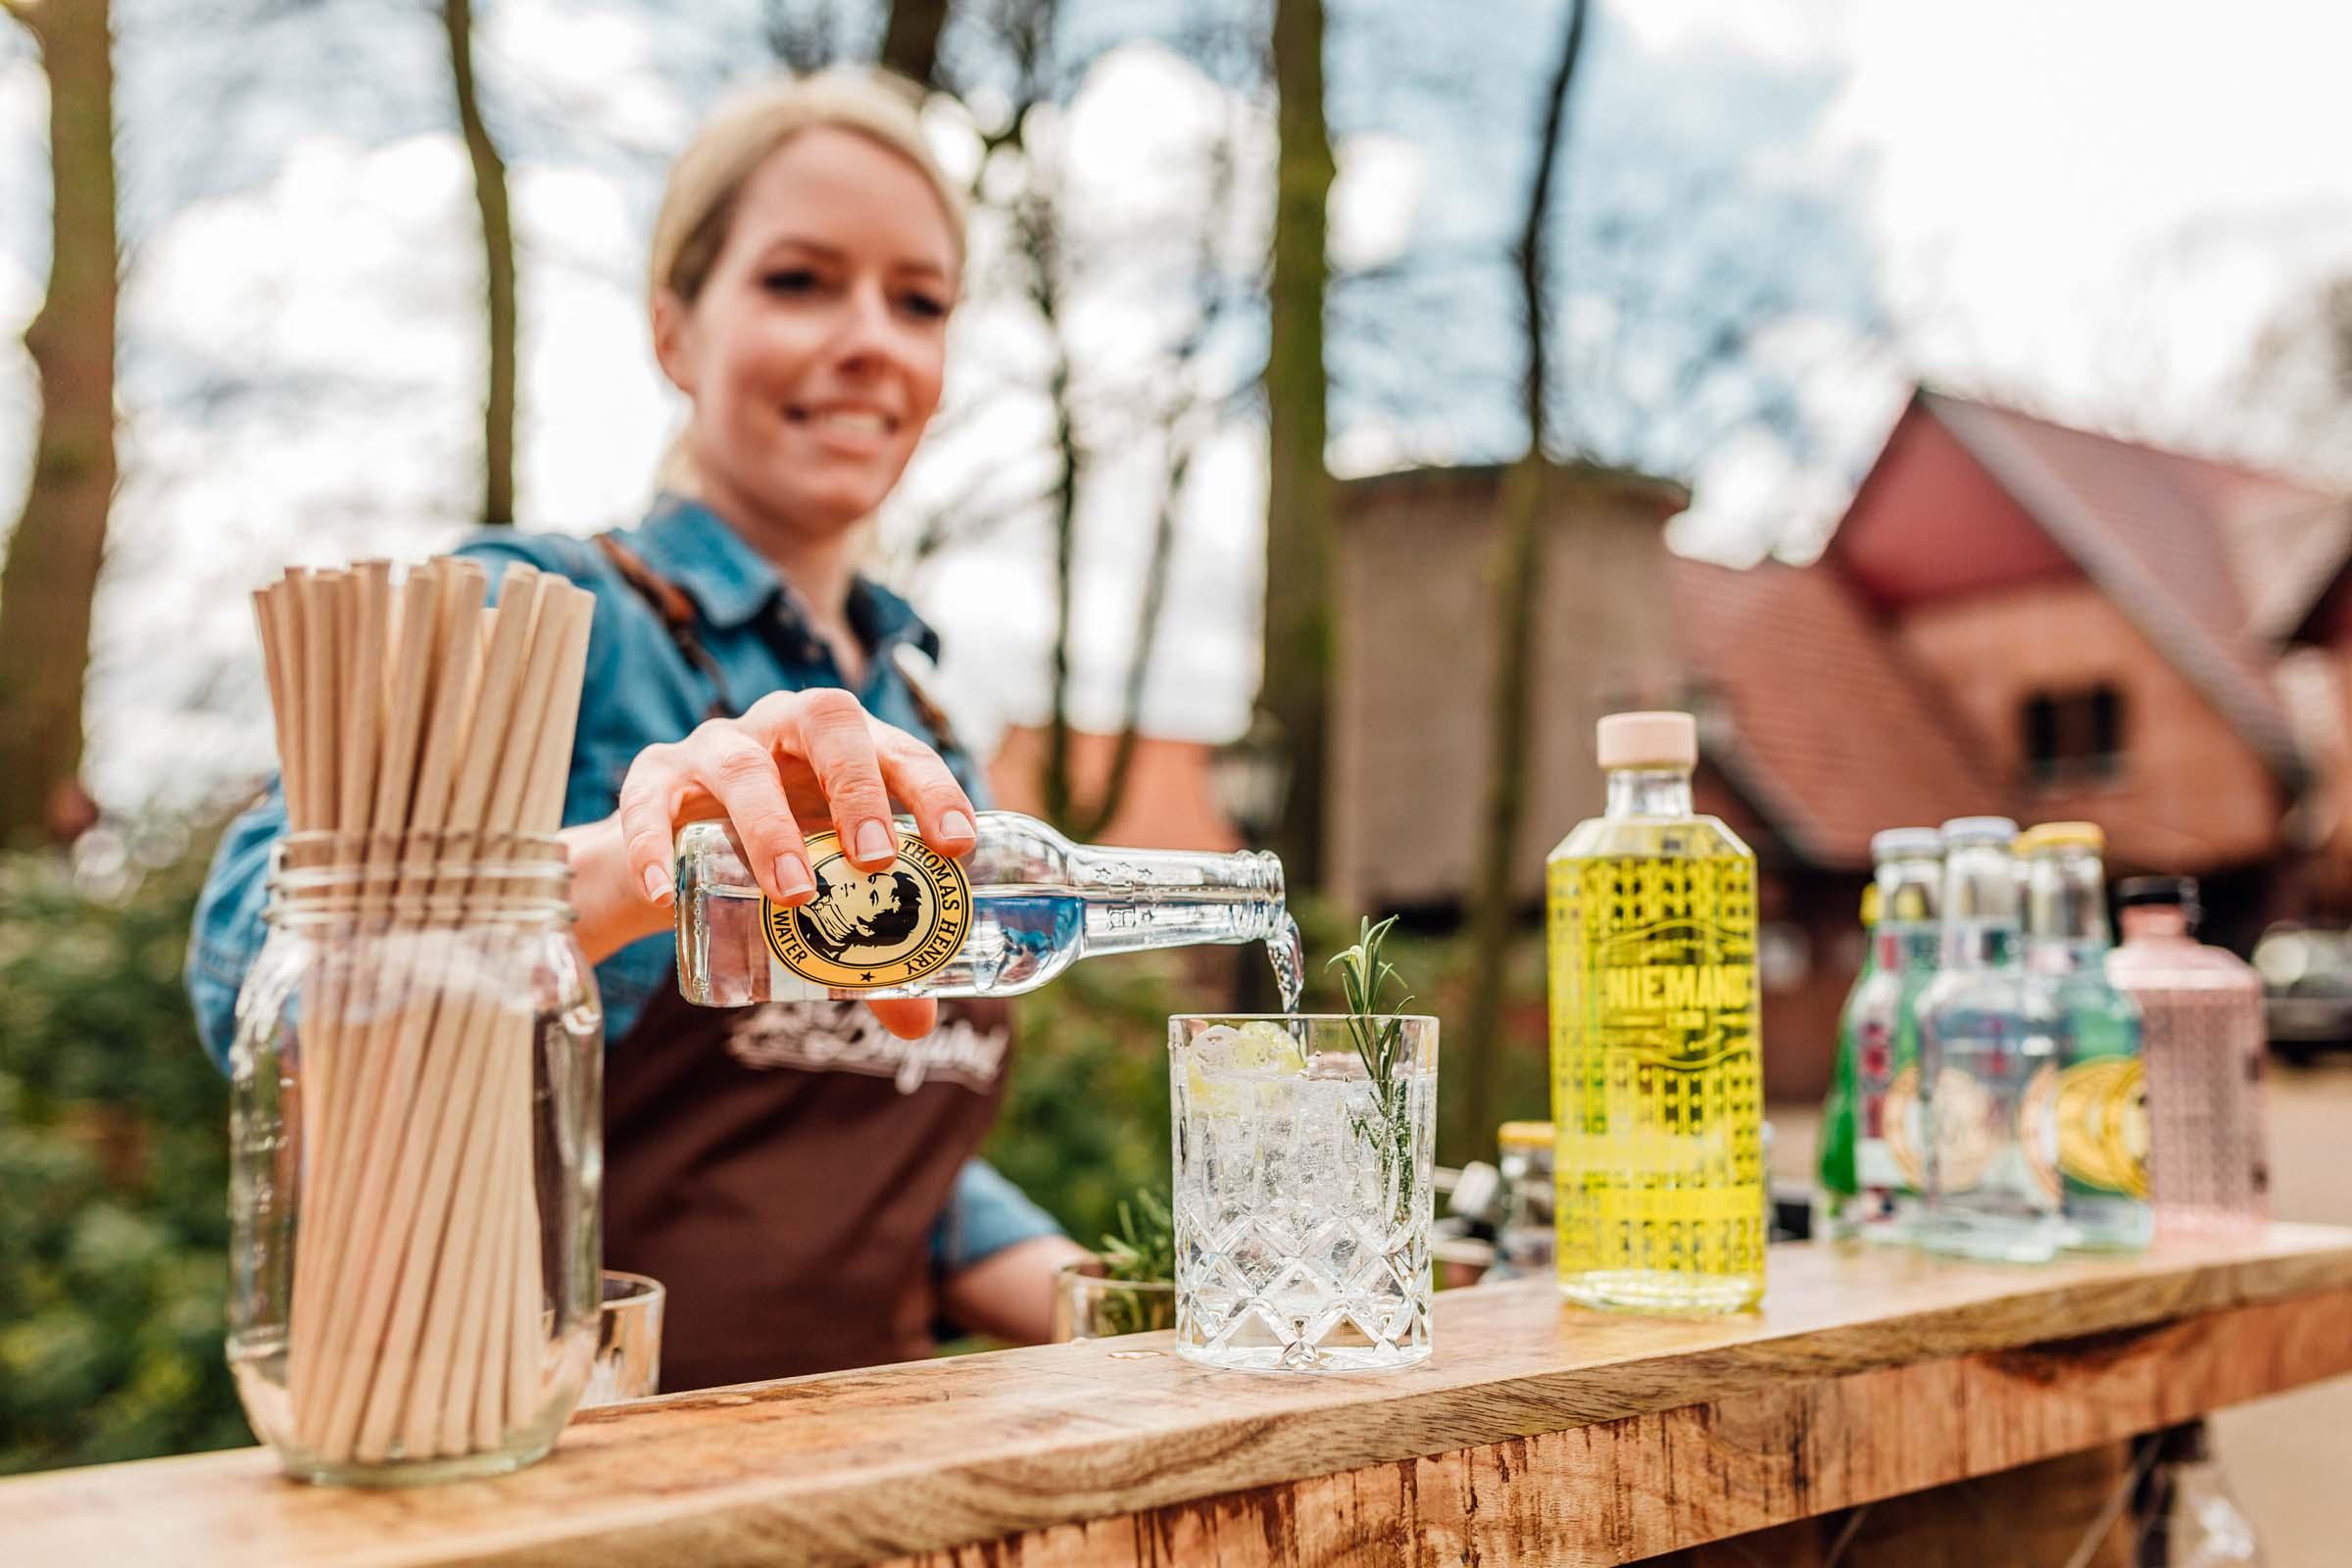 Mobile | Bar | Ape | Bulli | Cocktailservice | Cocktail | Bus | Hannover | Getränke | Catering | Foodtruck | Sektempfang | Standesamt | Hochzeit | Barkeeper | Hochzeit | Mieten | Event | Buchen | Barformat